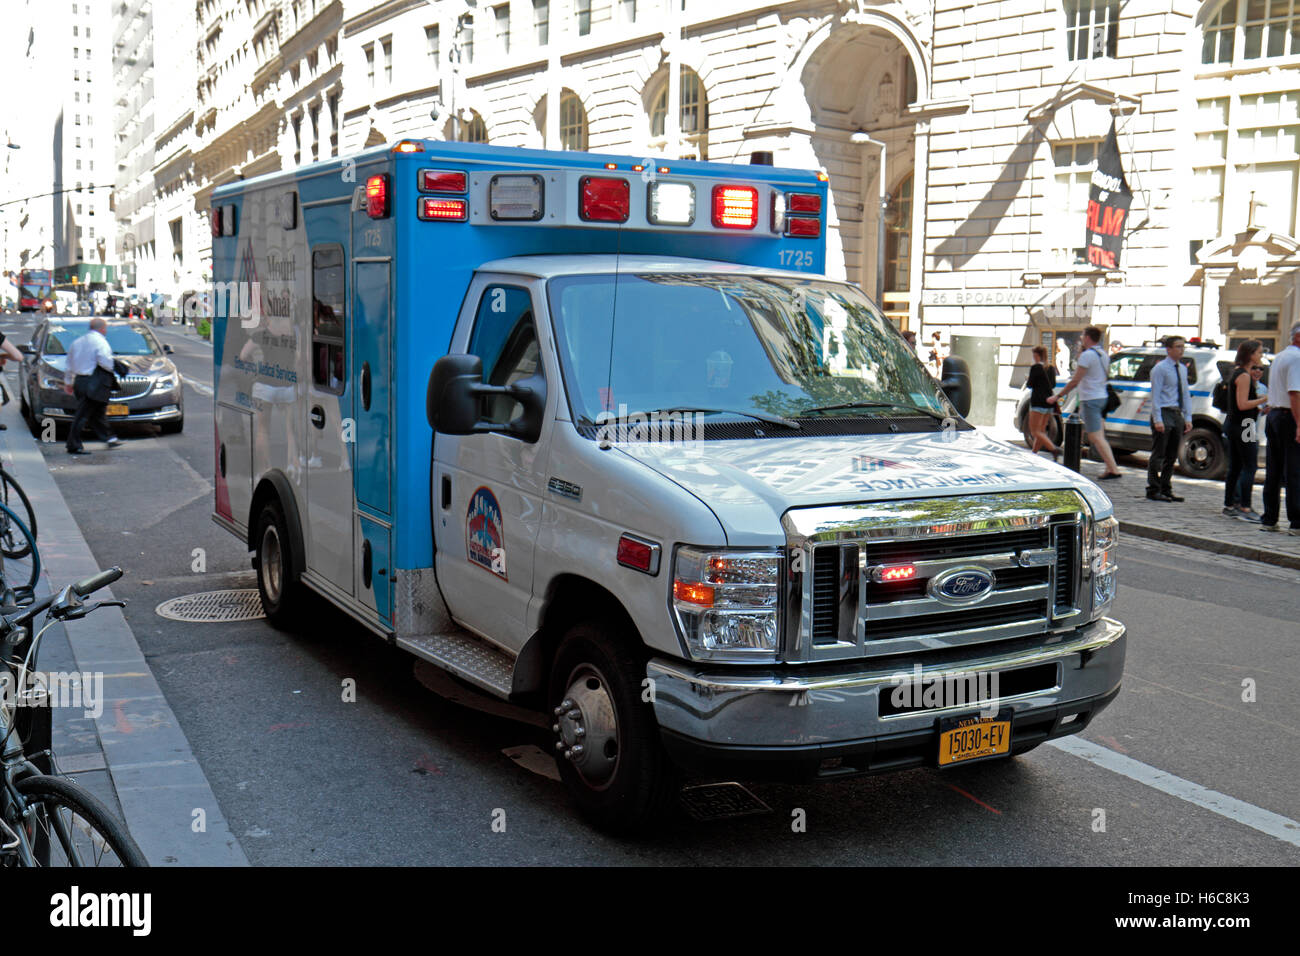 A Mount Sinai ambulance on an emergency call (lights flashing) in Manhattan, New York, United States. - Stock Image